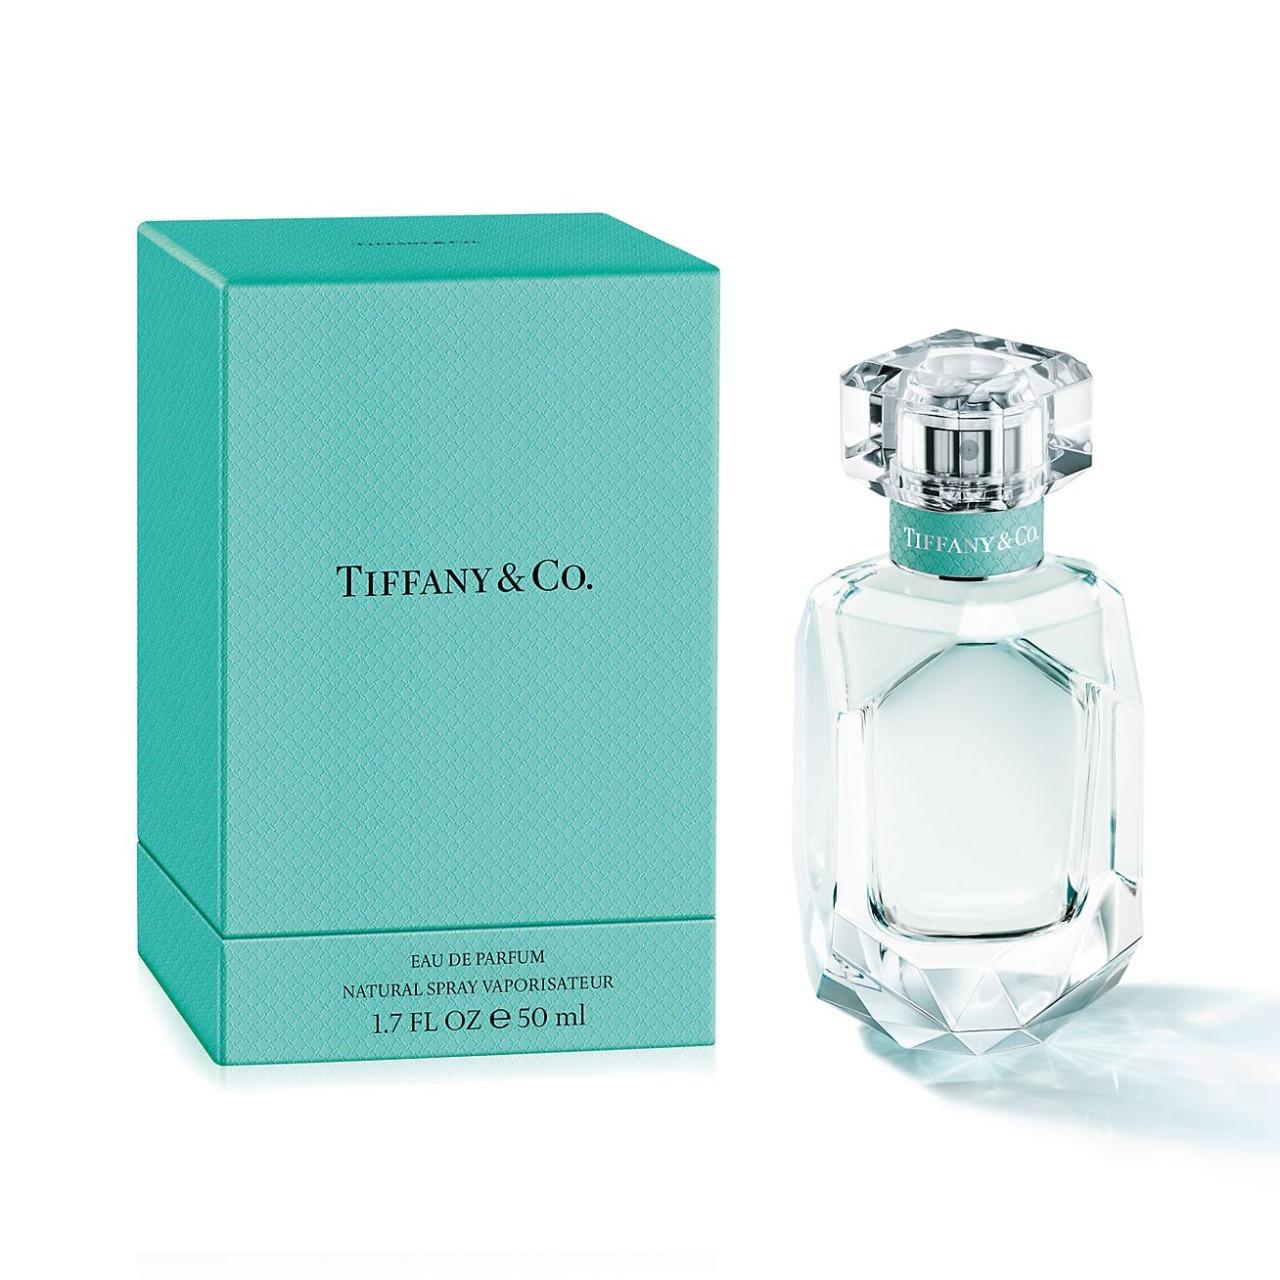 Tiffany & Co Eau de Parfum 50 ml